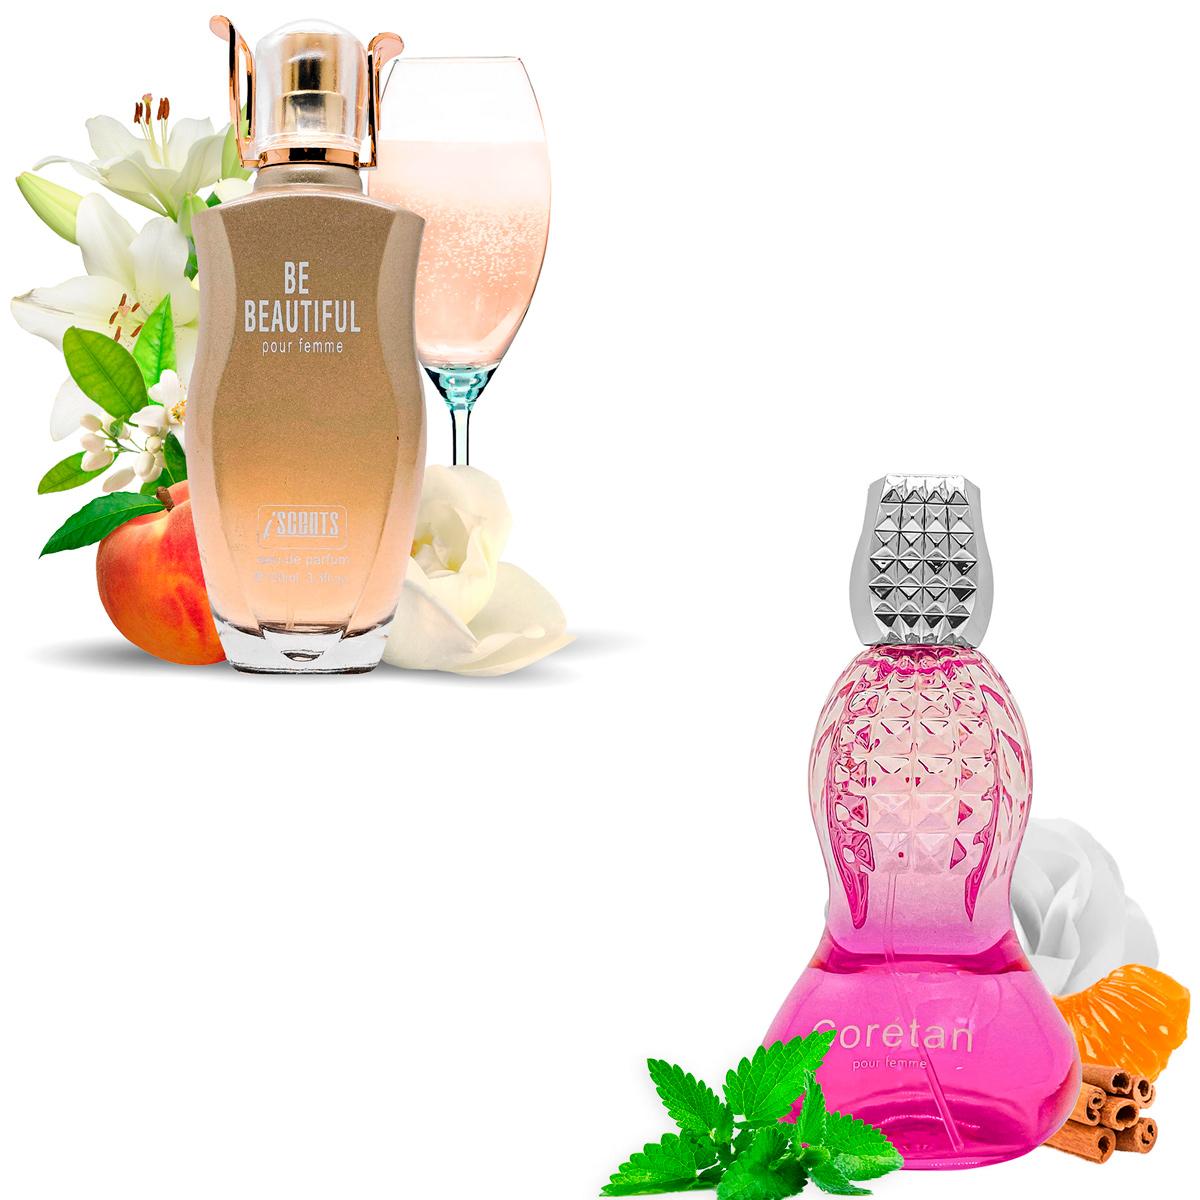 Kit 2 Perfumes Importados Be Beautiful e Coretan I Scents